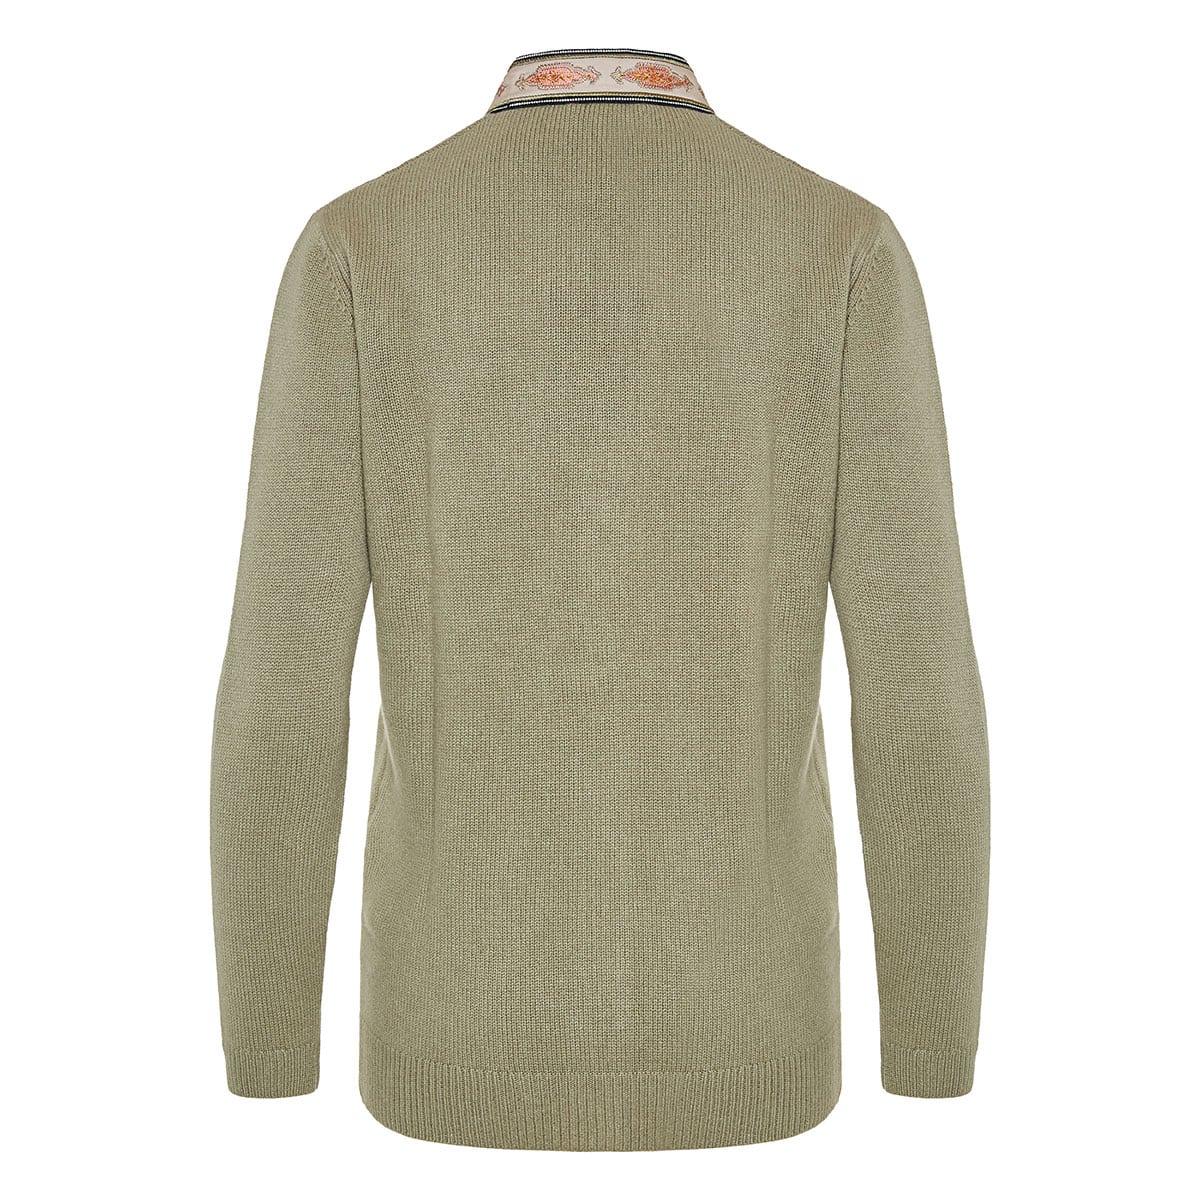 Embroidered-trim cardigan